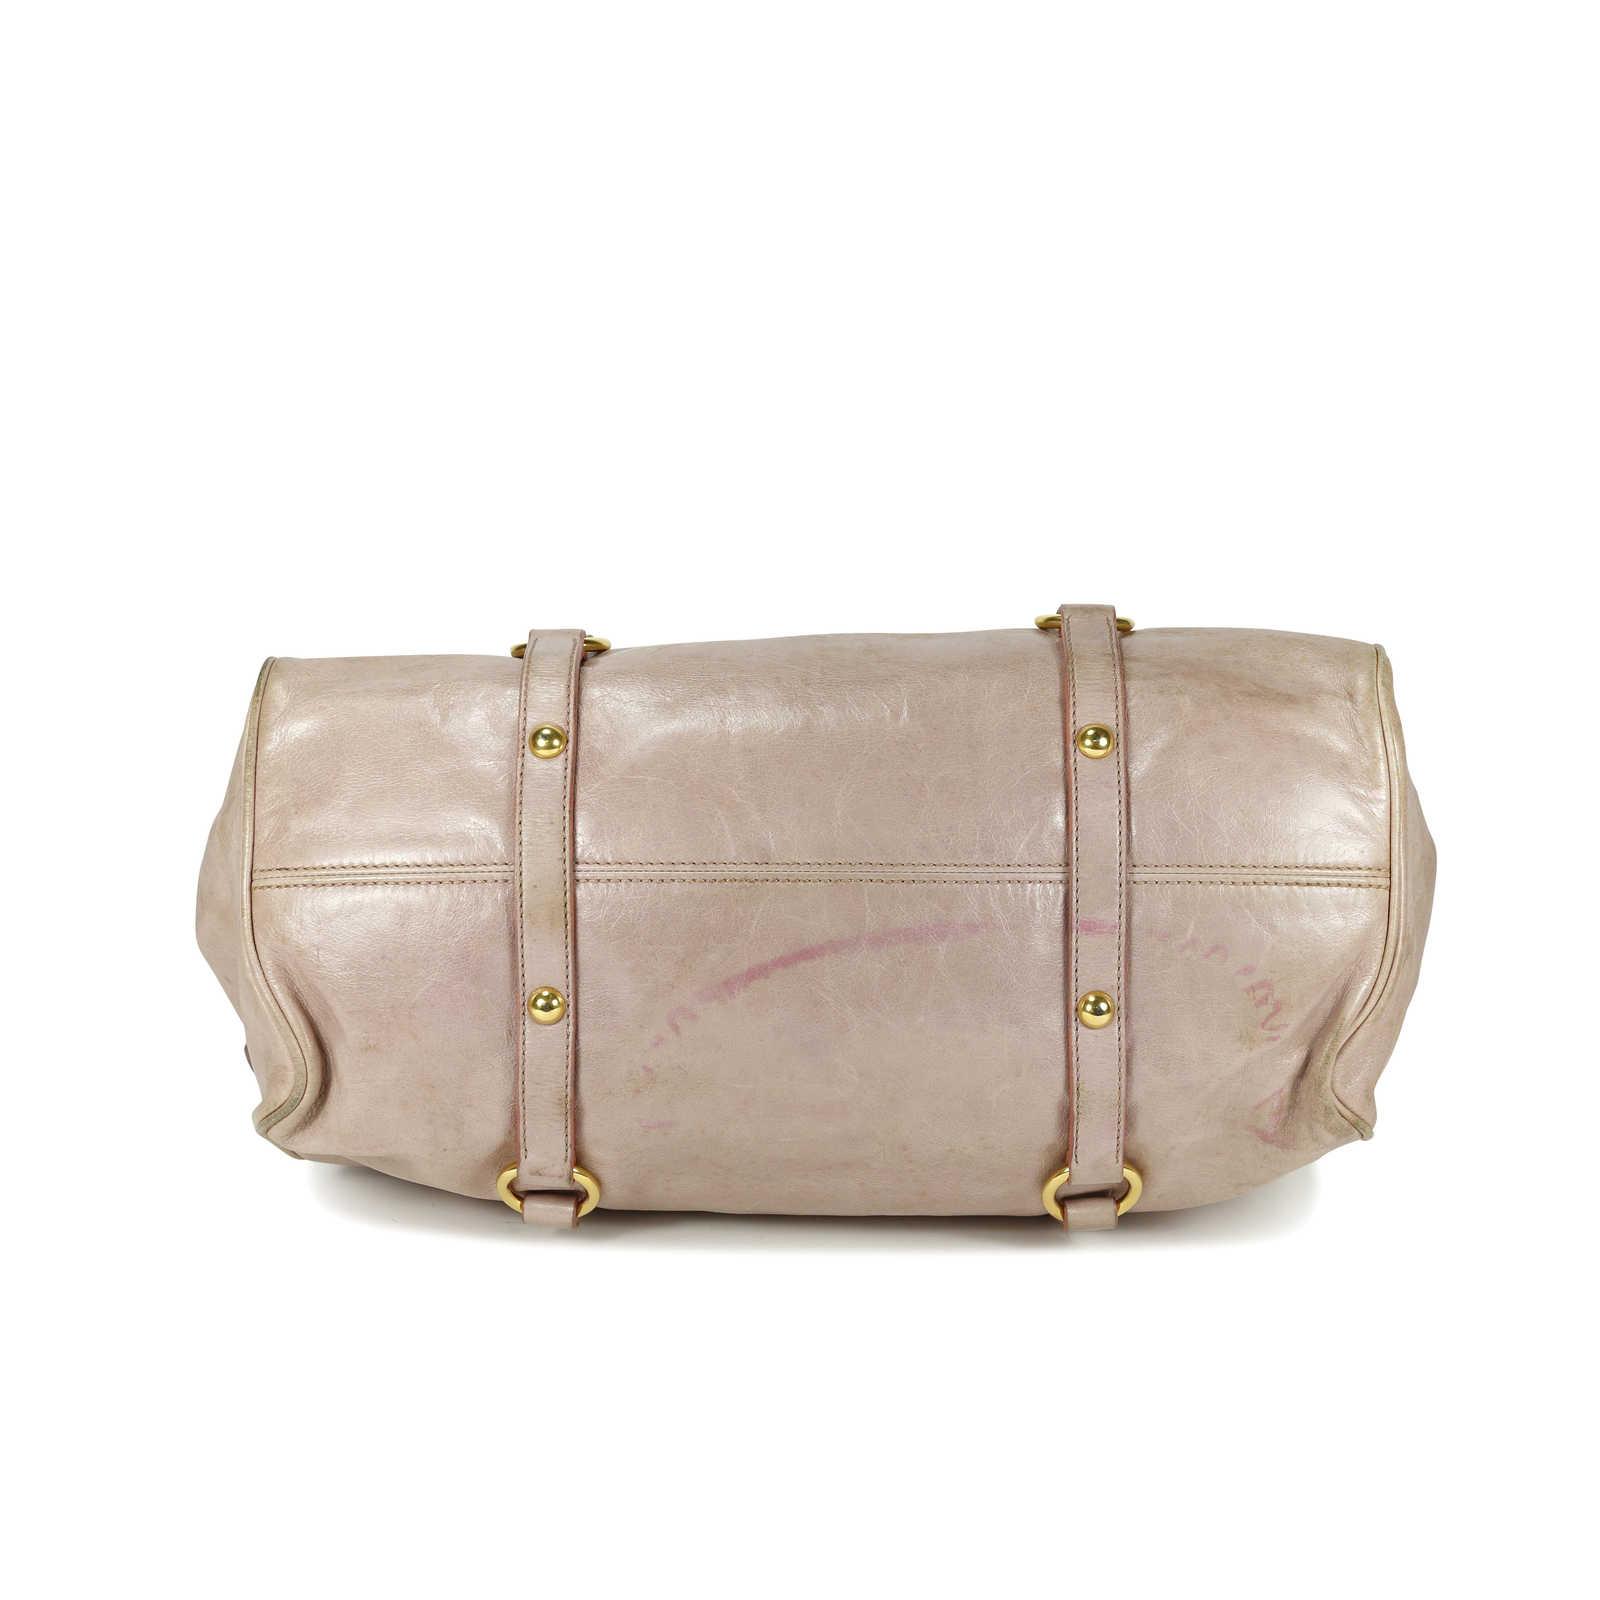 48945d9a4185 ... Authentic Second Hand Miu Miu Vitello Lux Bow Bag (PSS-150-00002) ...